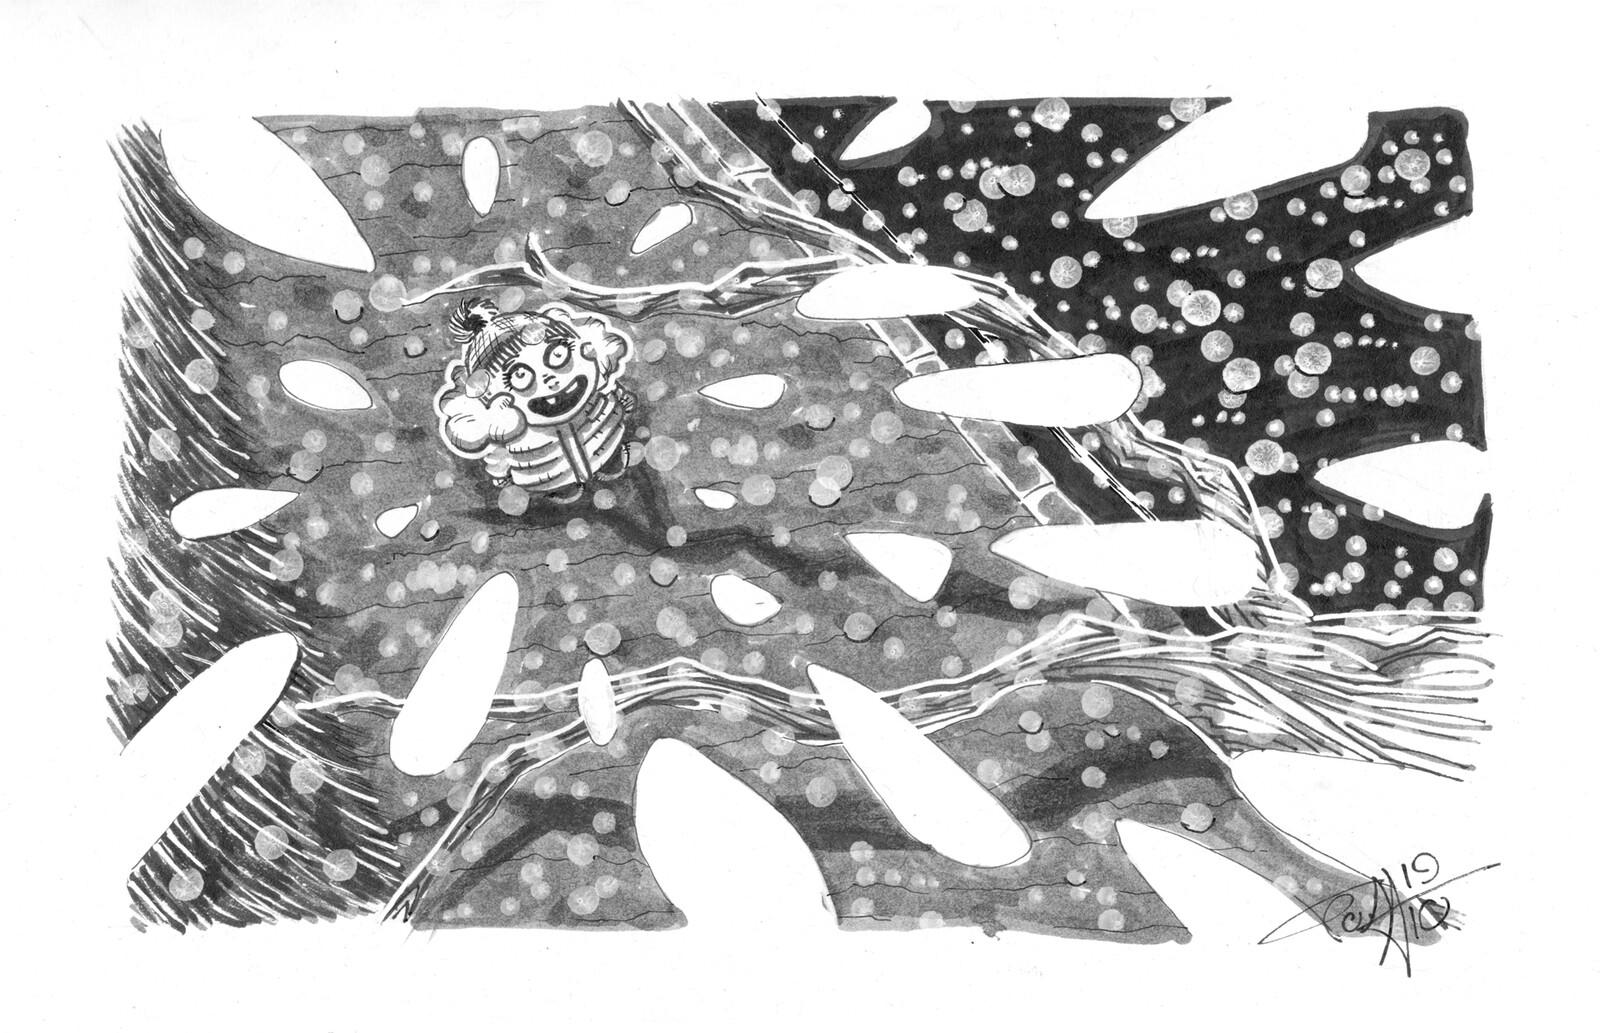 11.Snow